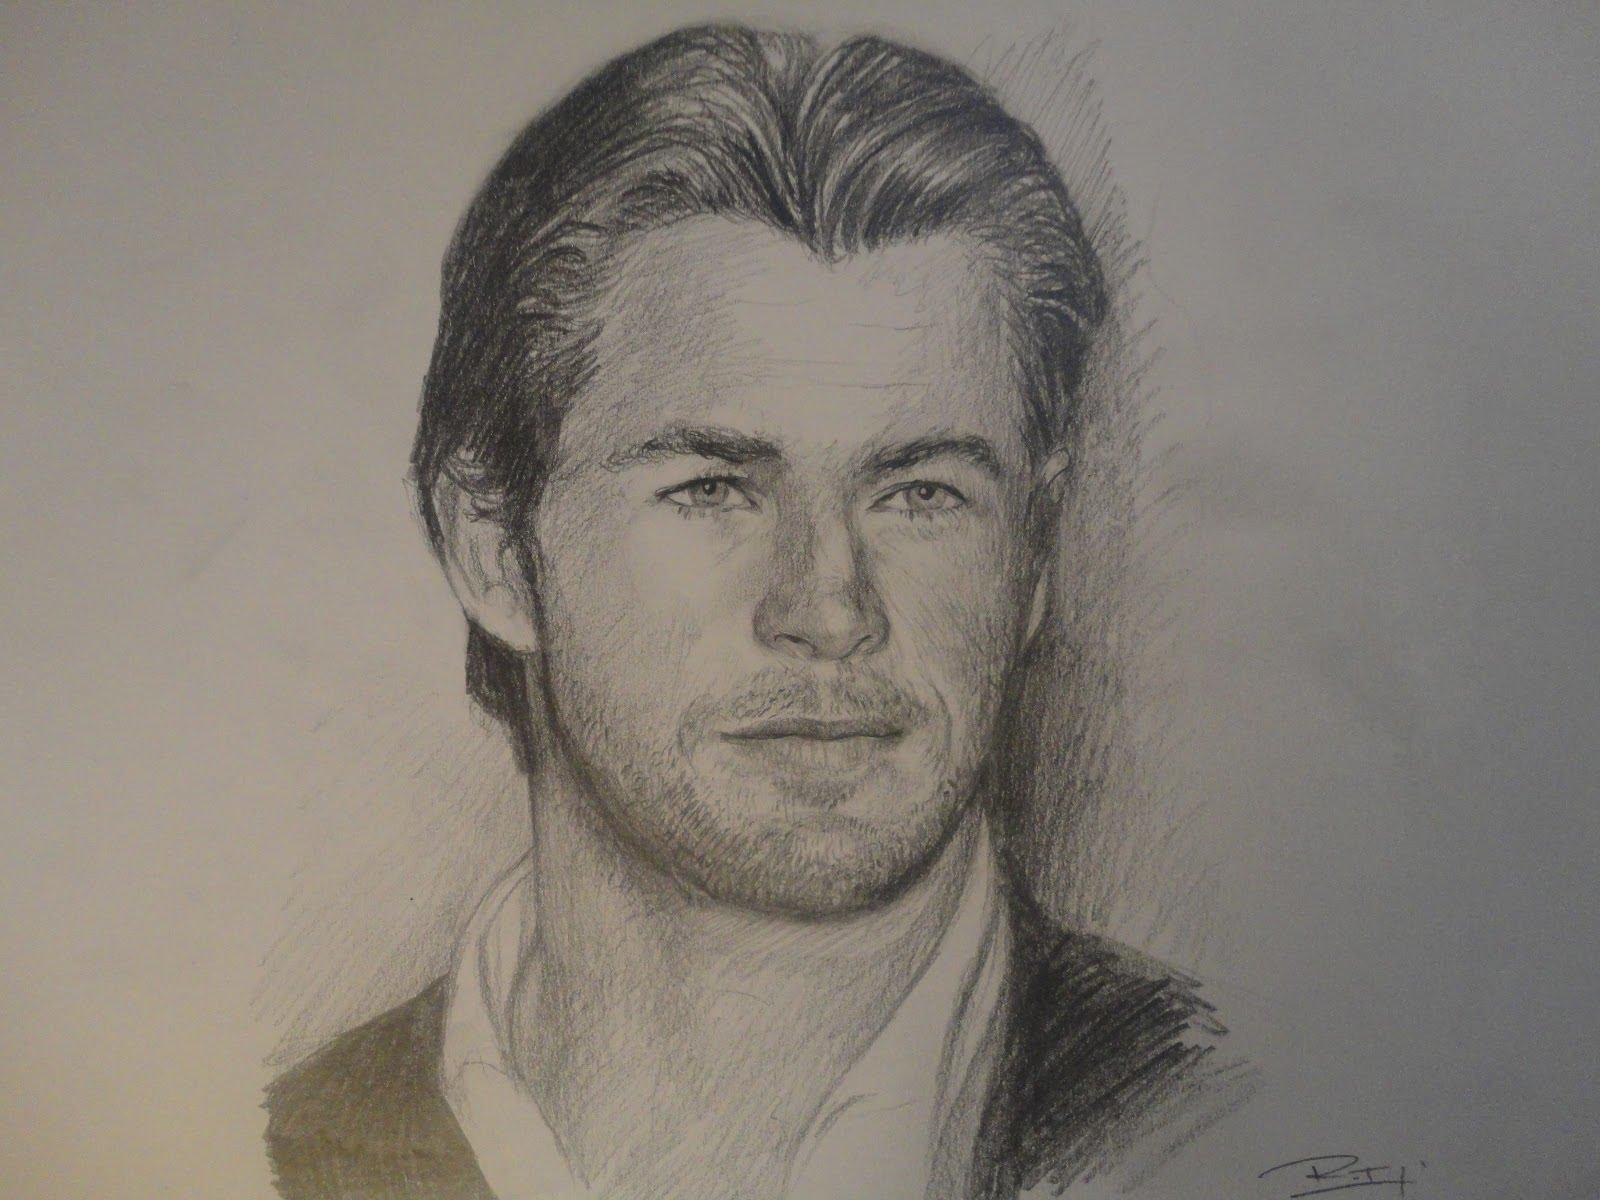 1600x1200 Chris Hemsworth Portrait Drawing